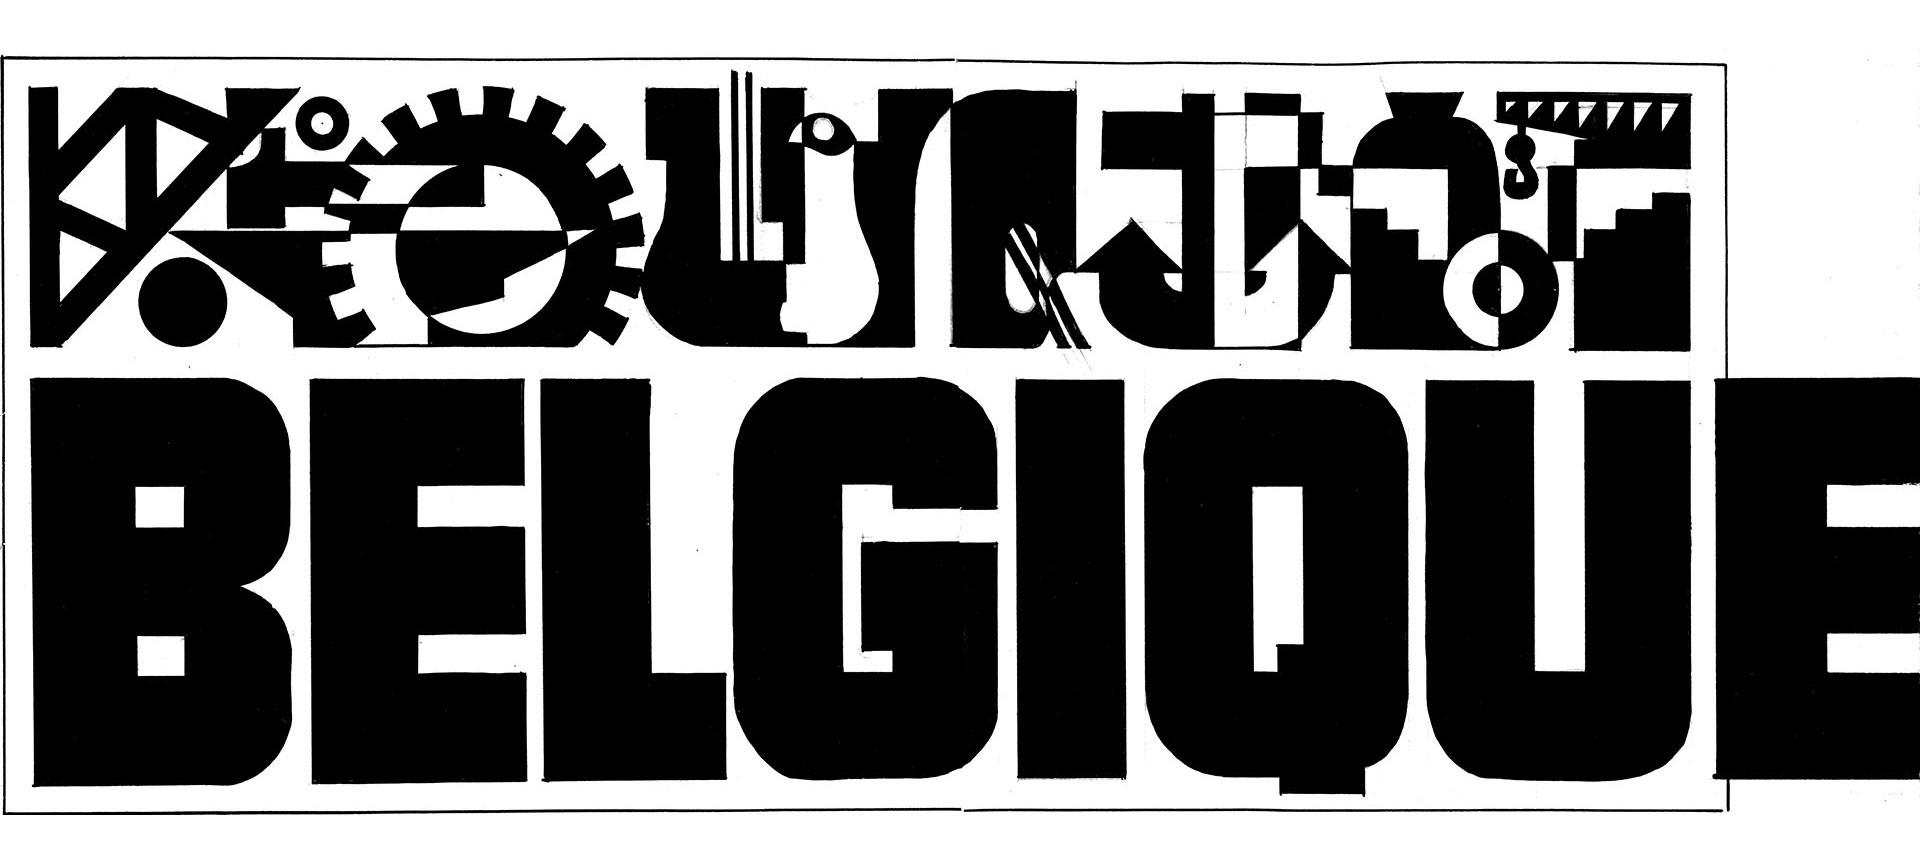 Typografie Opschriften Wereldtentoonstelling 1937